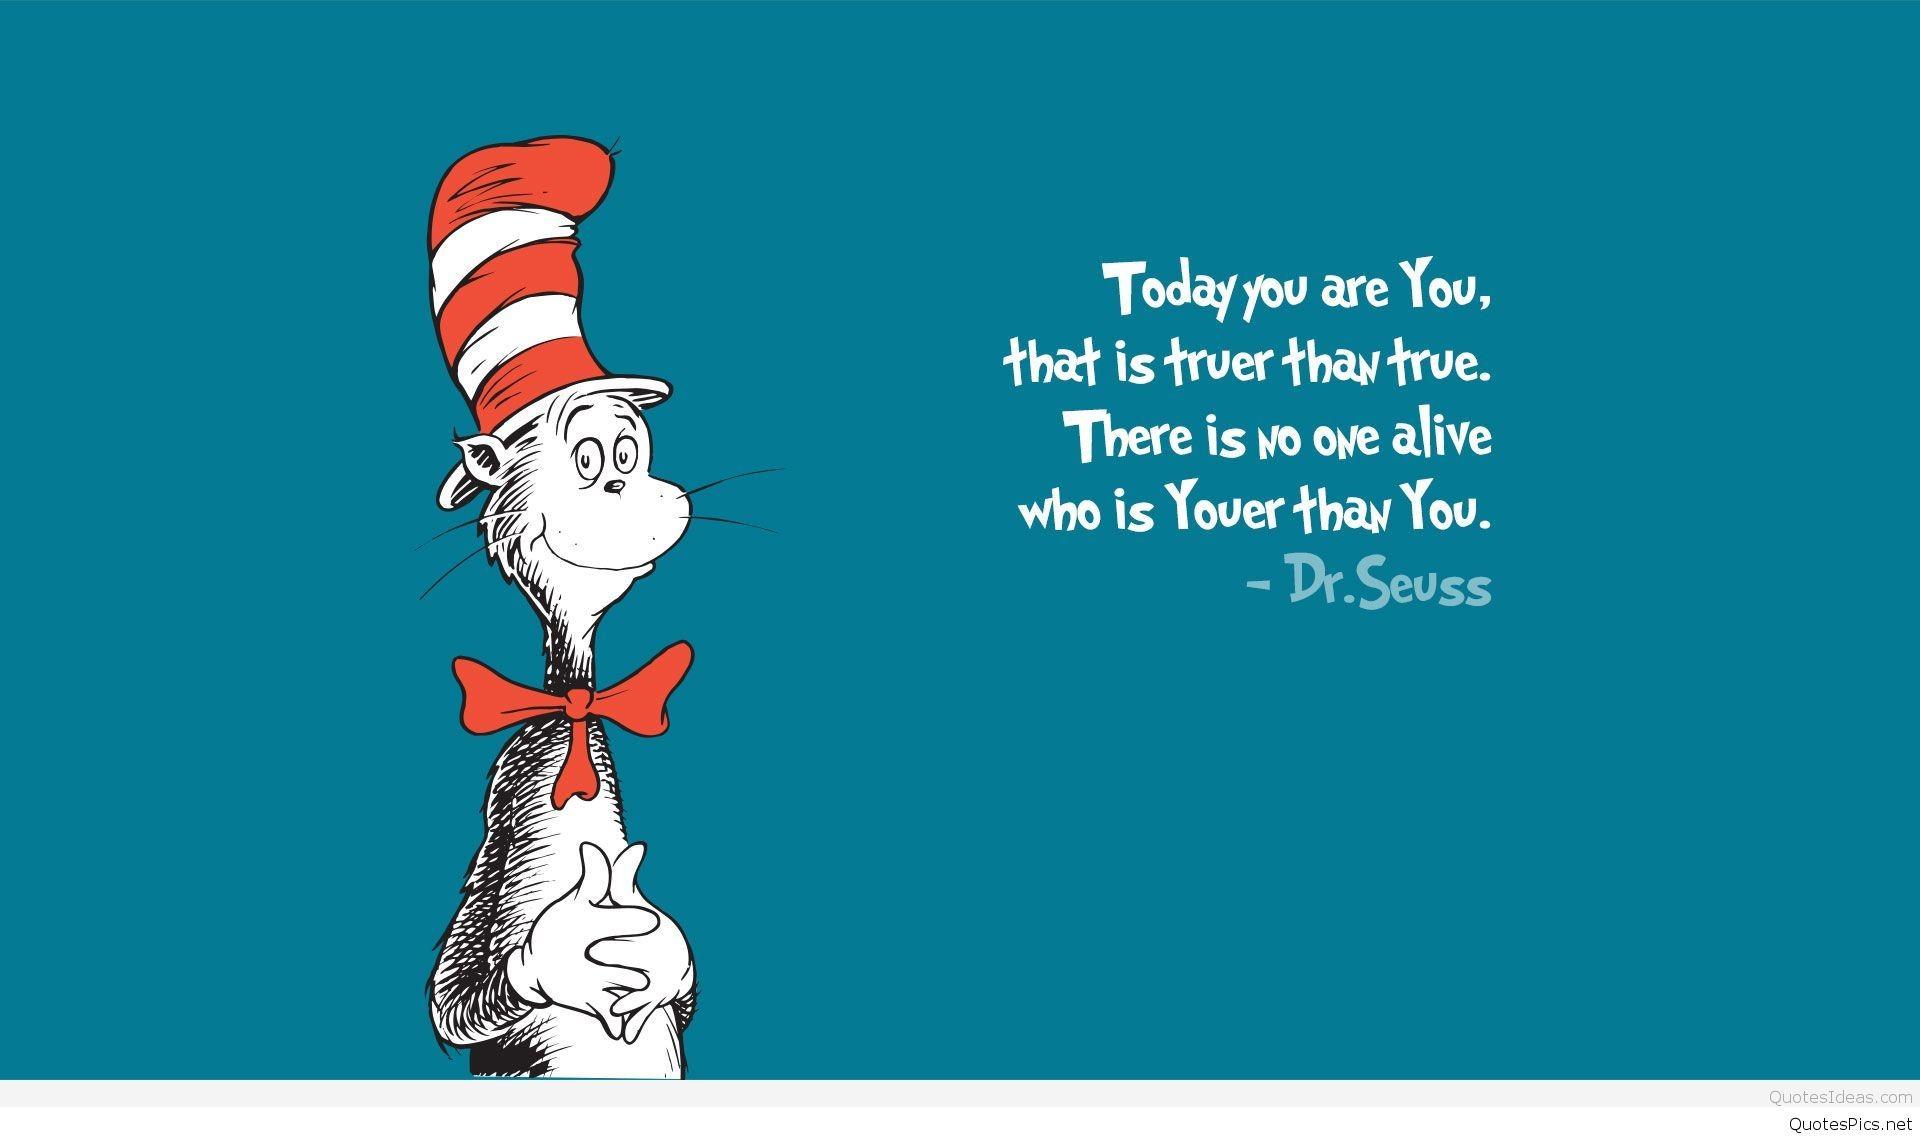 1920x1137, Dr Seuss Life Quotes Wallpaper   Data Id - Work Thank You Appreciation Quotes - HD Wallpaper